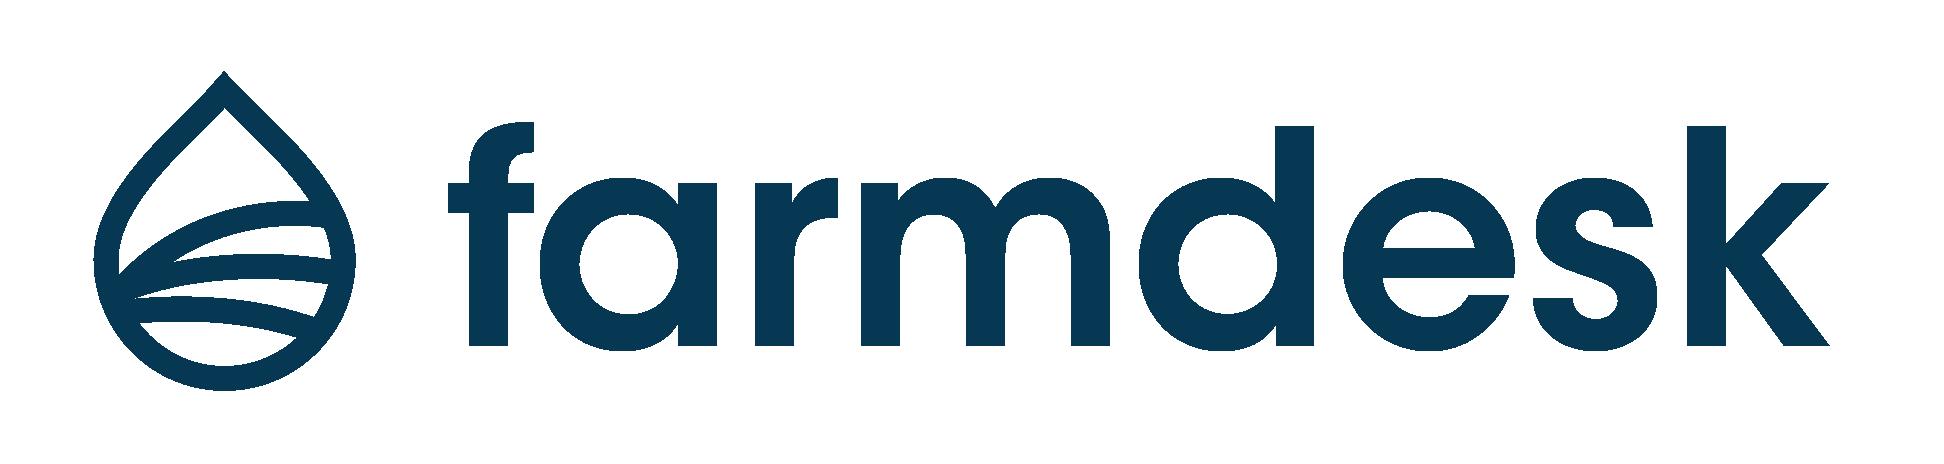 Farmdesk logo